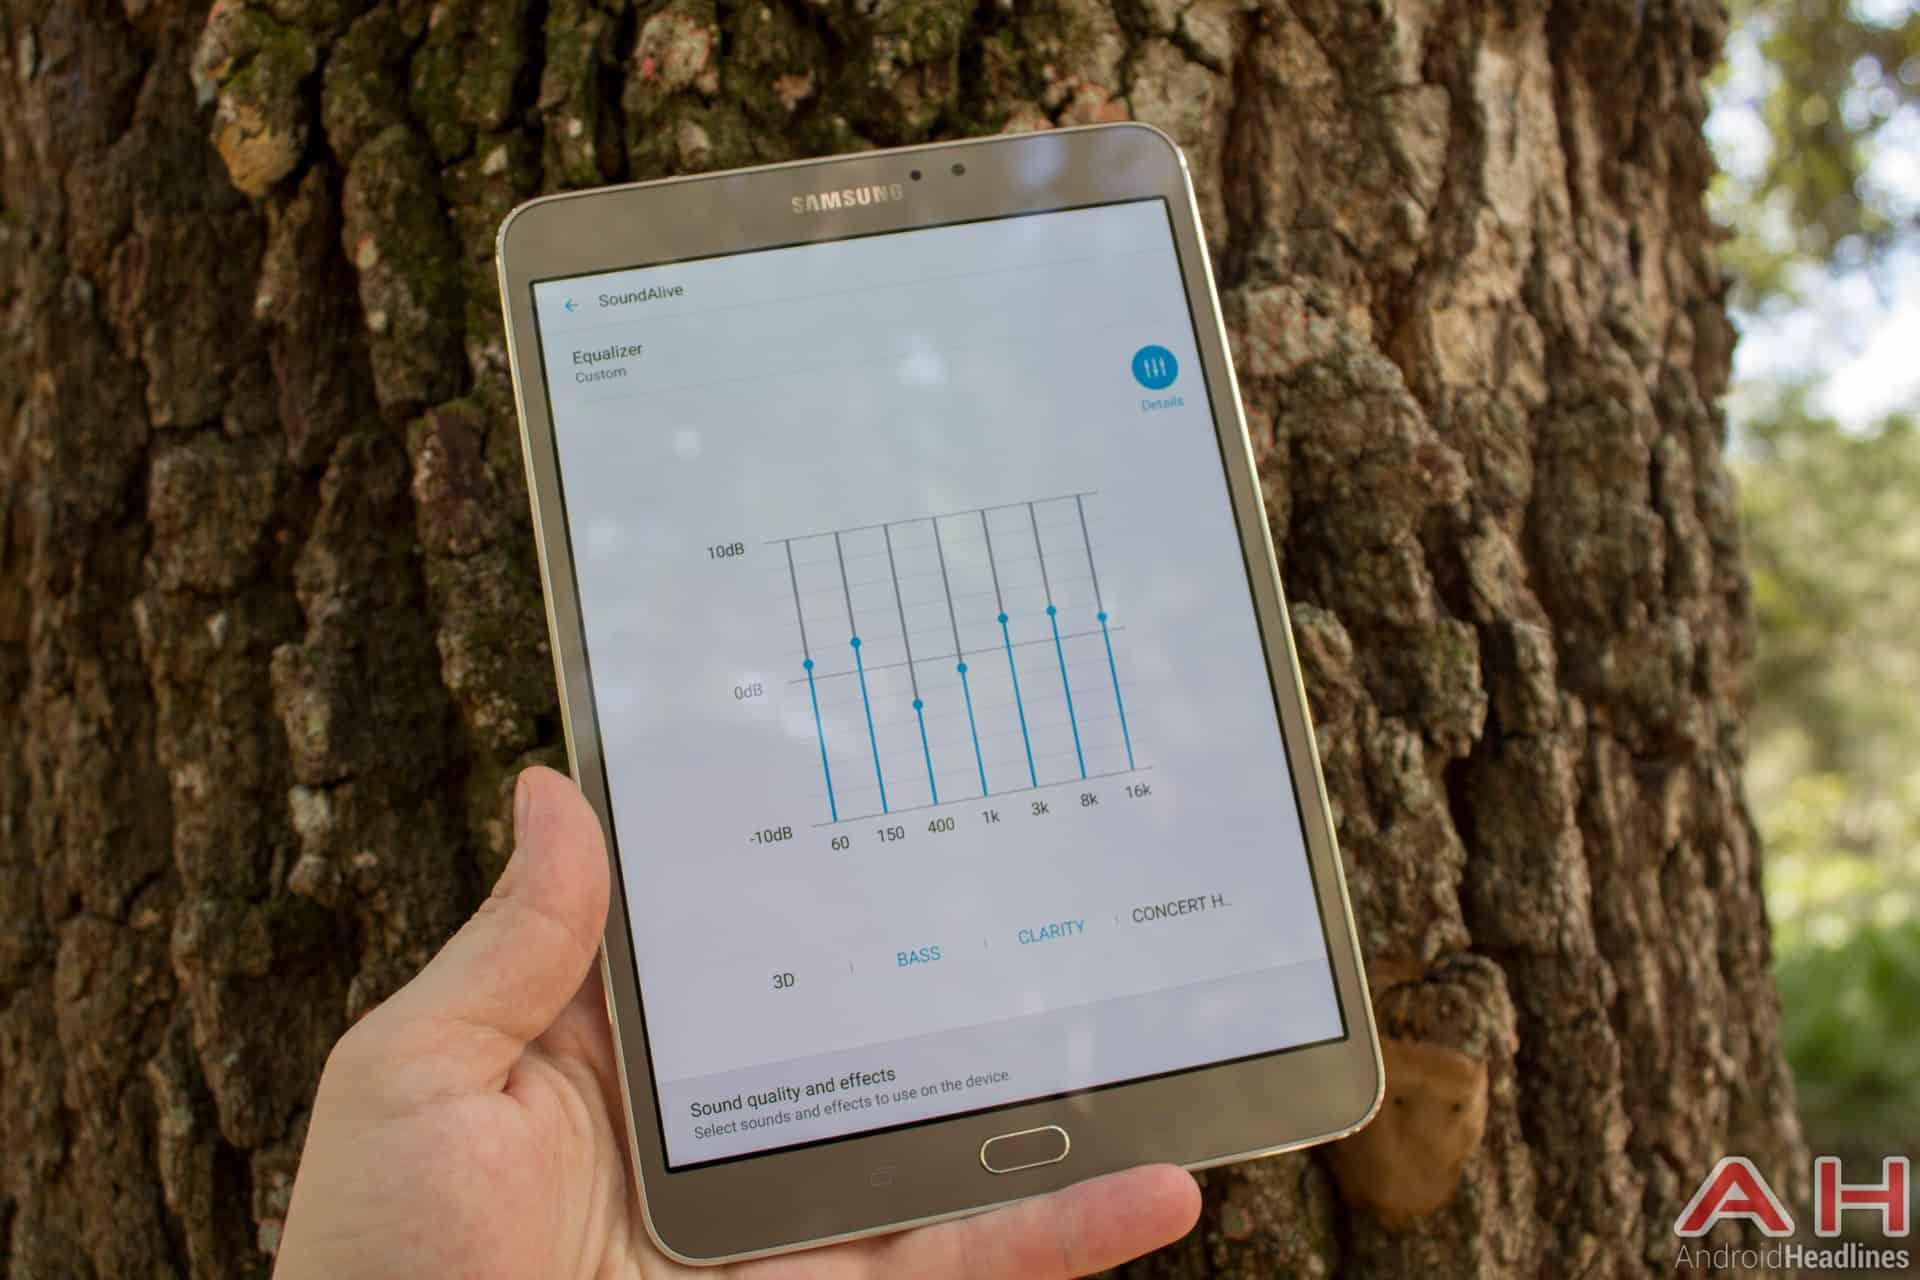 Samsung-Galaxy-Tab-S2-AH-audio